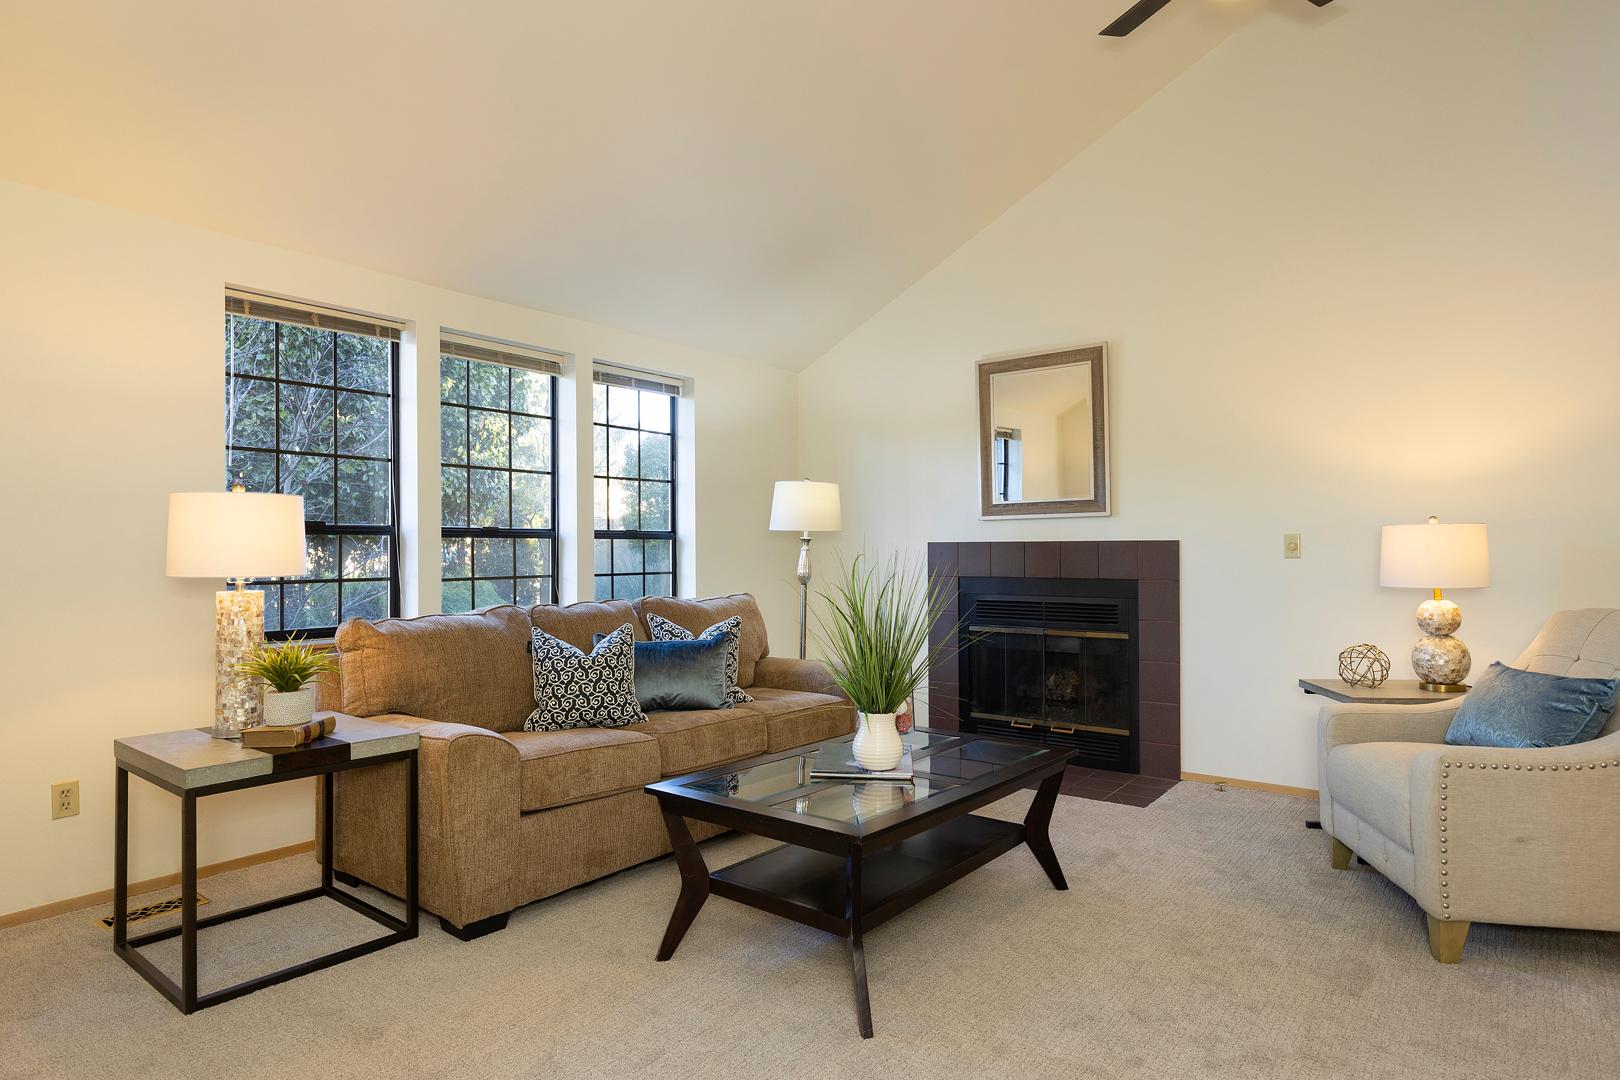 24 living room 1-1